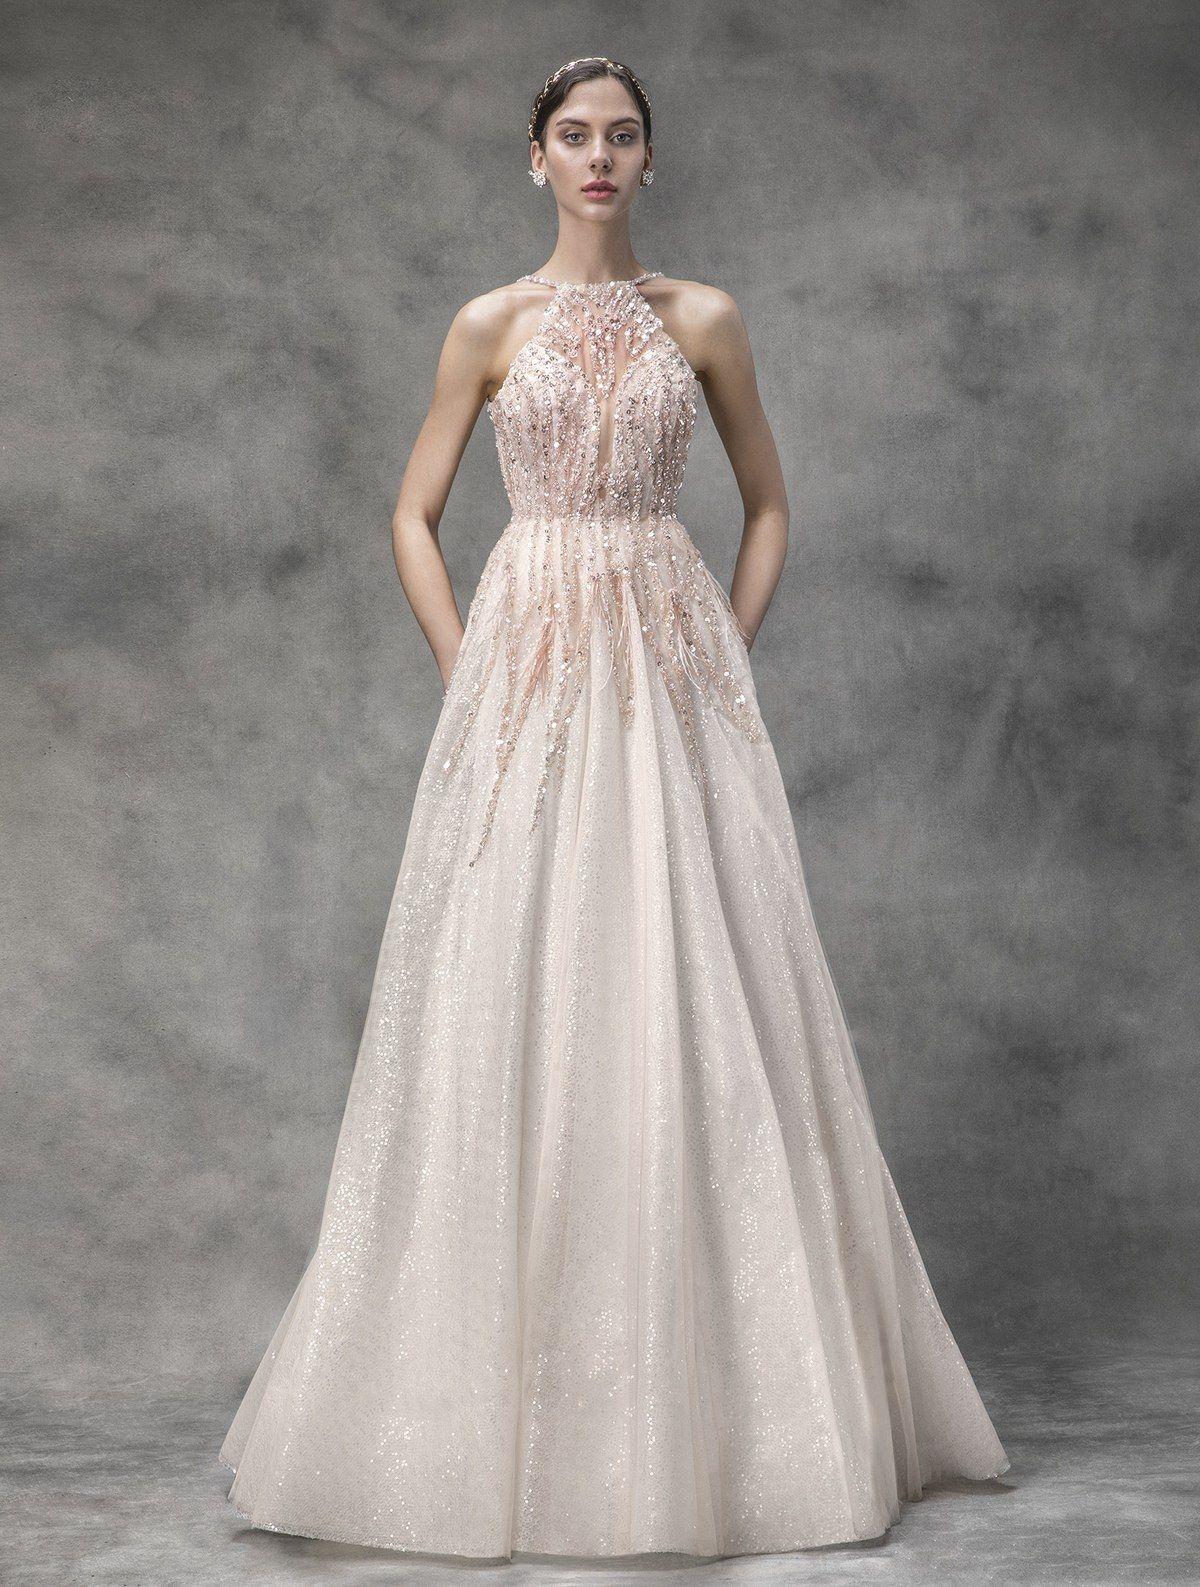 51c798f8c33c0 Victoria KyriaKides Bridal Spring 2020 in 2019 | Wedding gowns ...